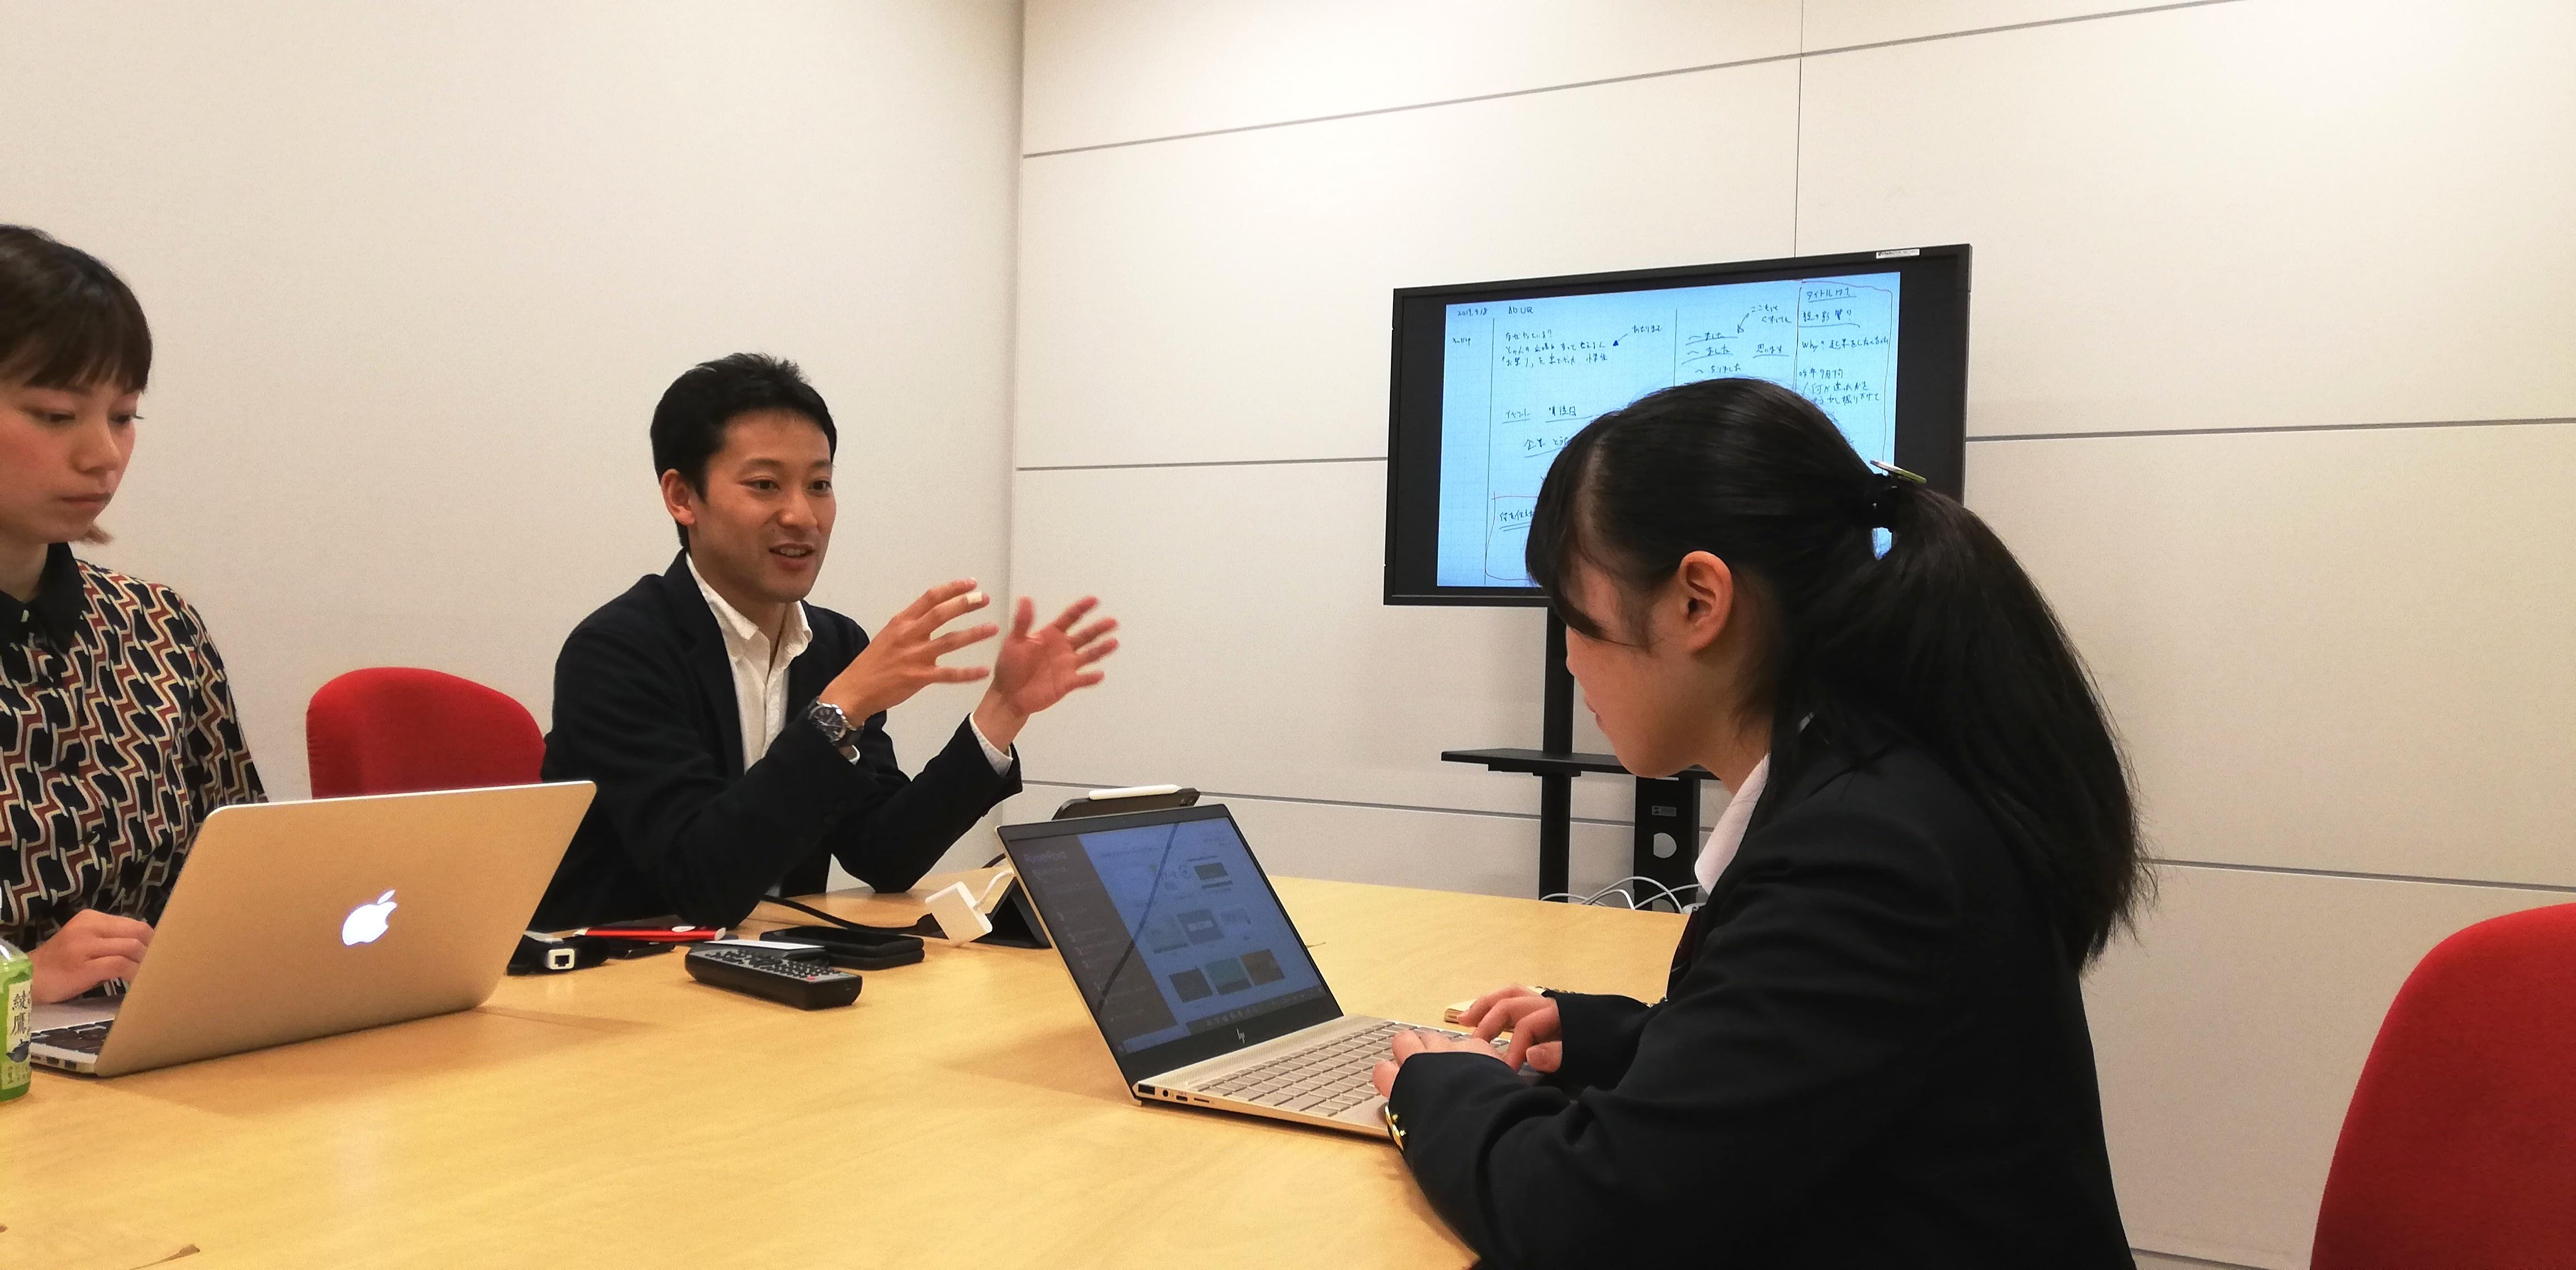 MOVED代表・渋谷によるプレゼントレーニング